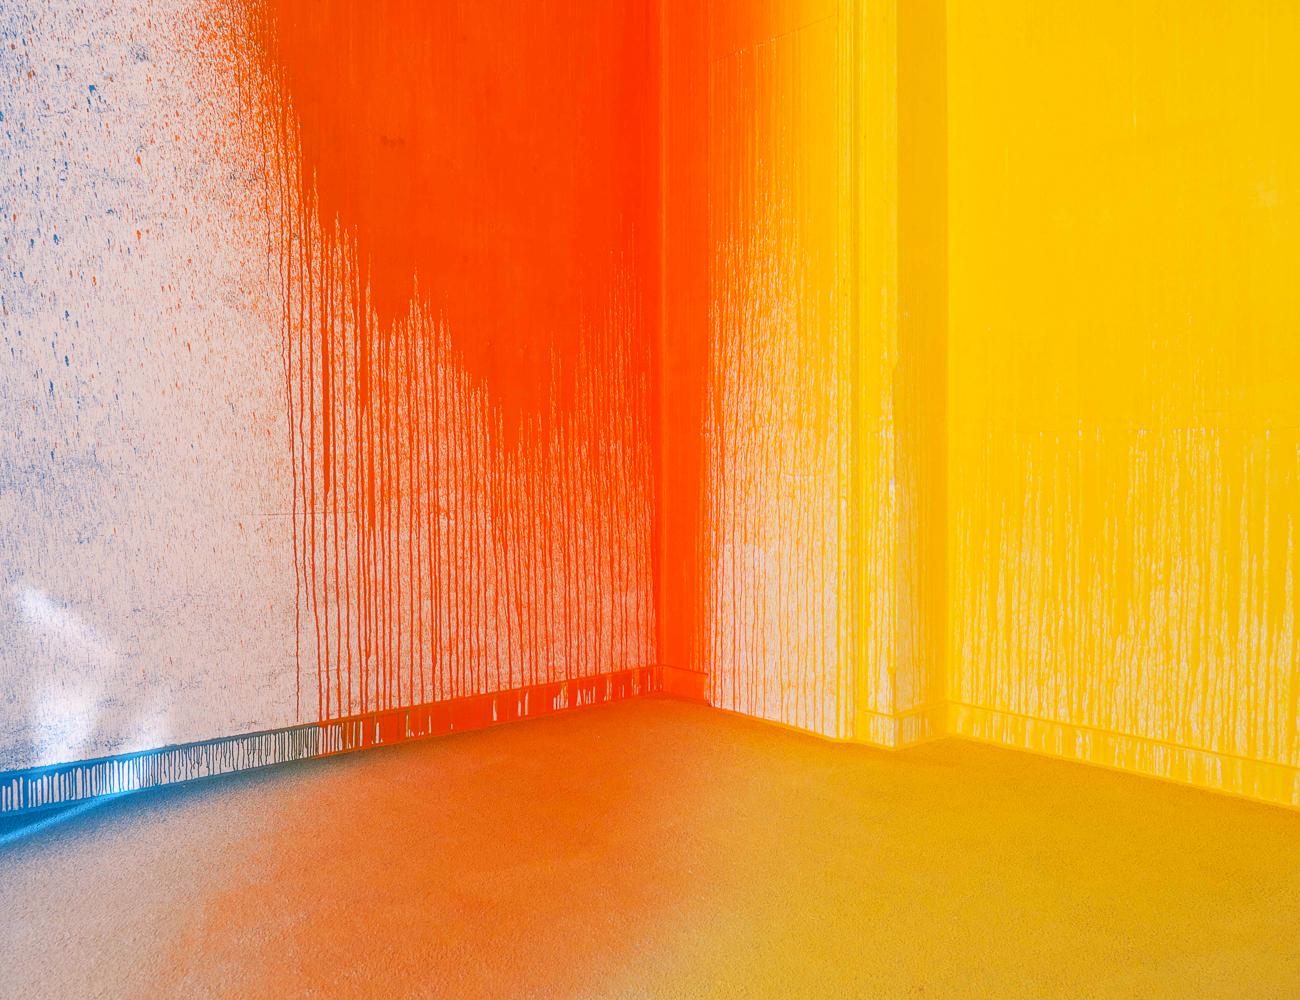 02 © Rutger de Vries, Color Disperser, 2019, Photo by Jan Tengbergen